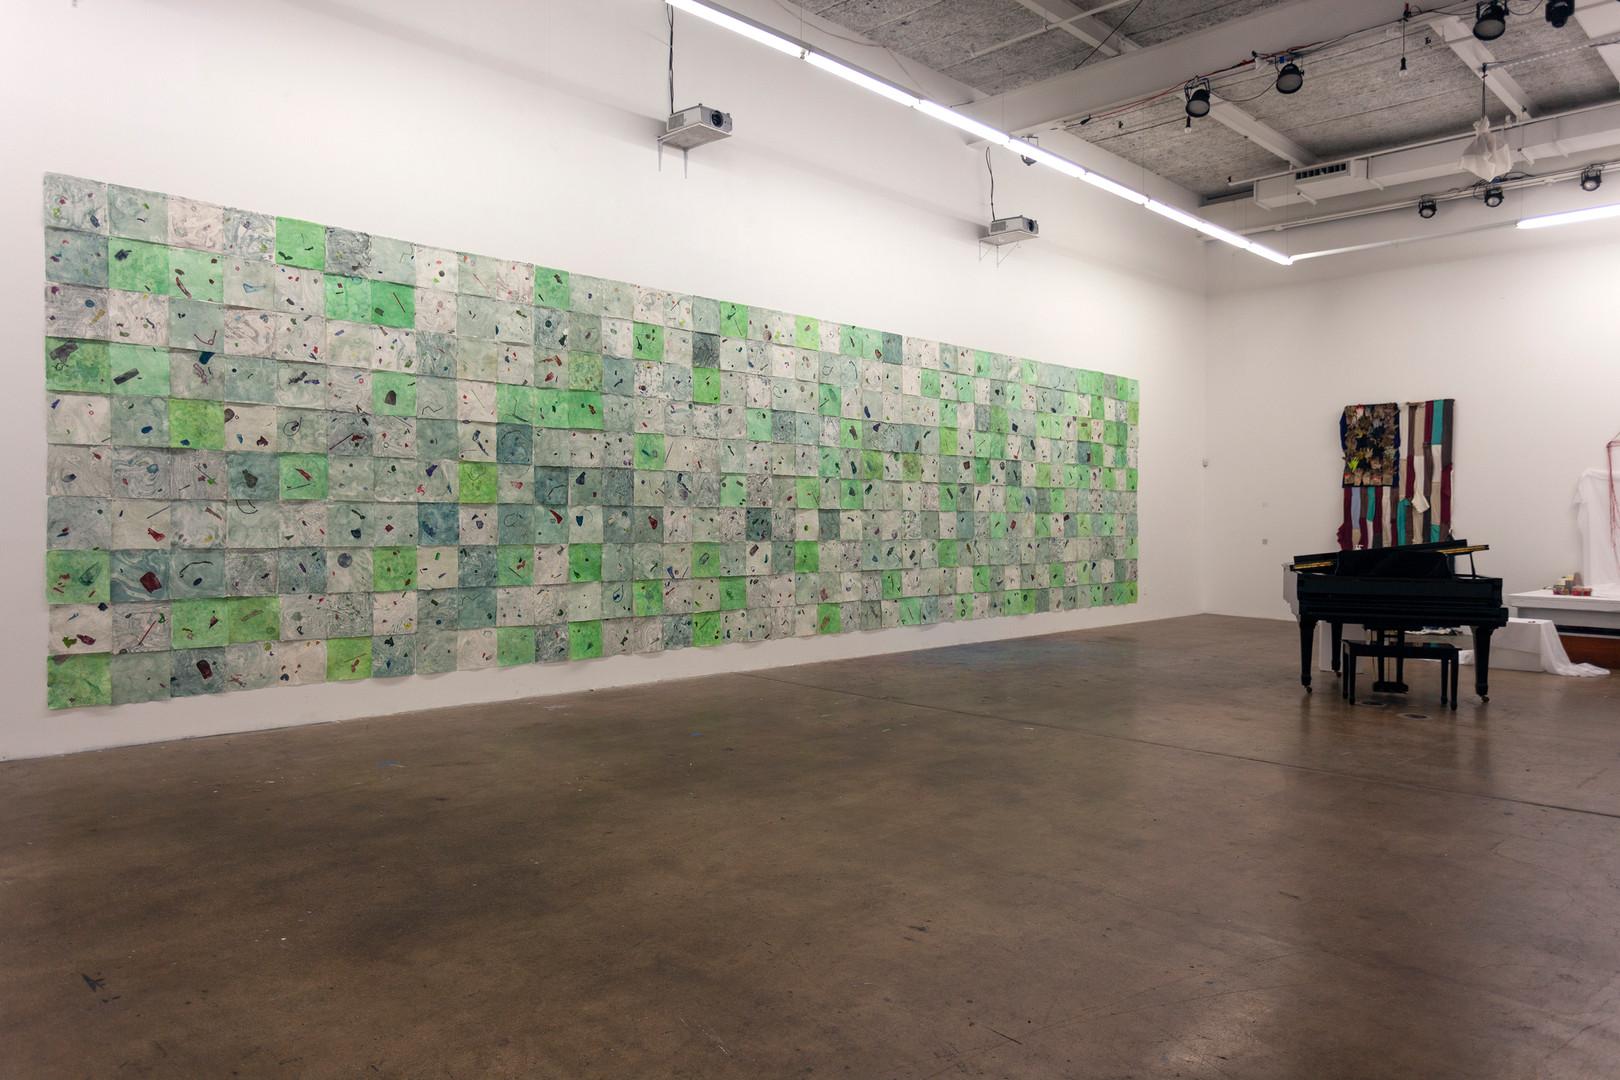 Amanda Thackray, 1,000 Square Feet (0.00701459%) Project